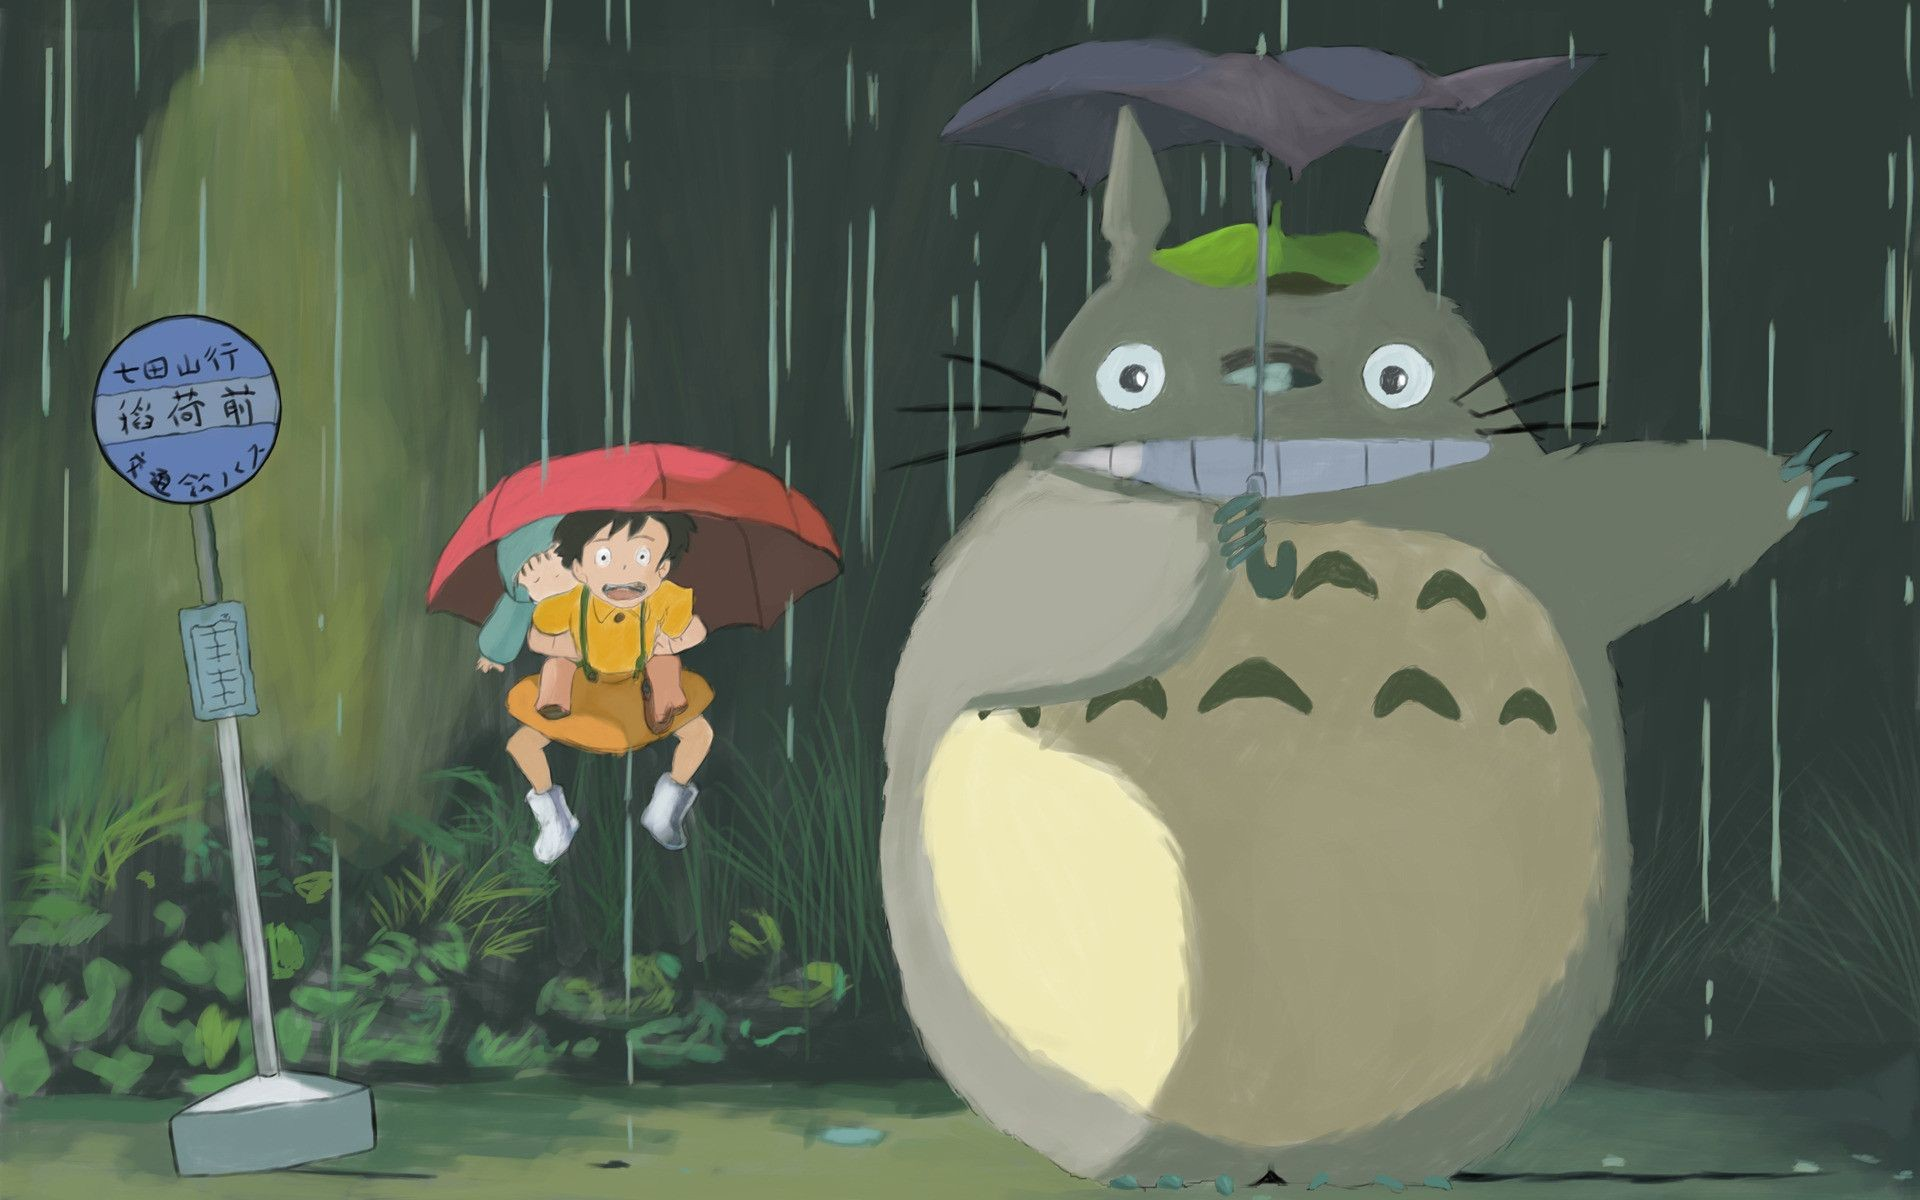 Cute Cartoon Hd Wallpapers Free Download My Neighbor Totoro Wallpaper 183 ① Download Free Beautiful